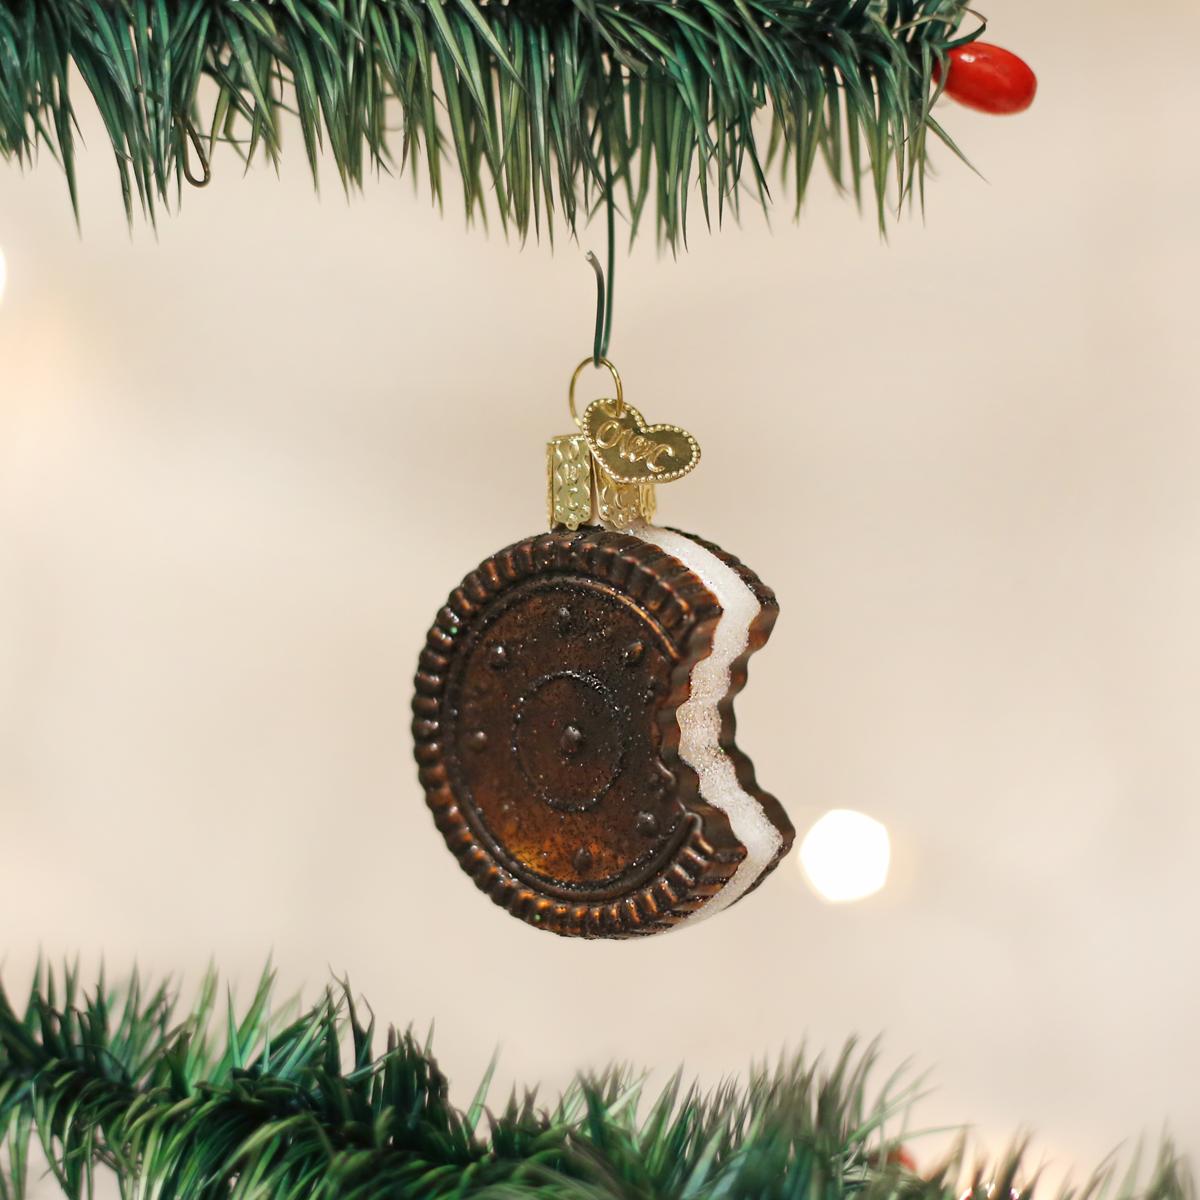 Chocolate Oreo Cookie Glass Ornament